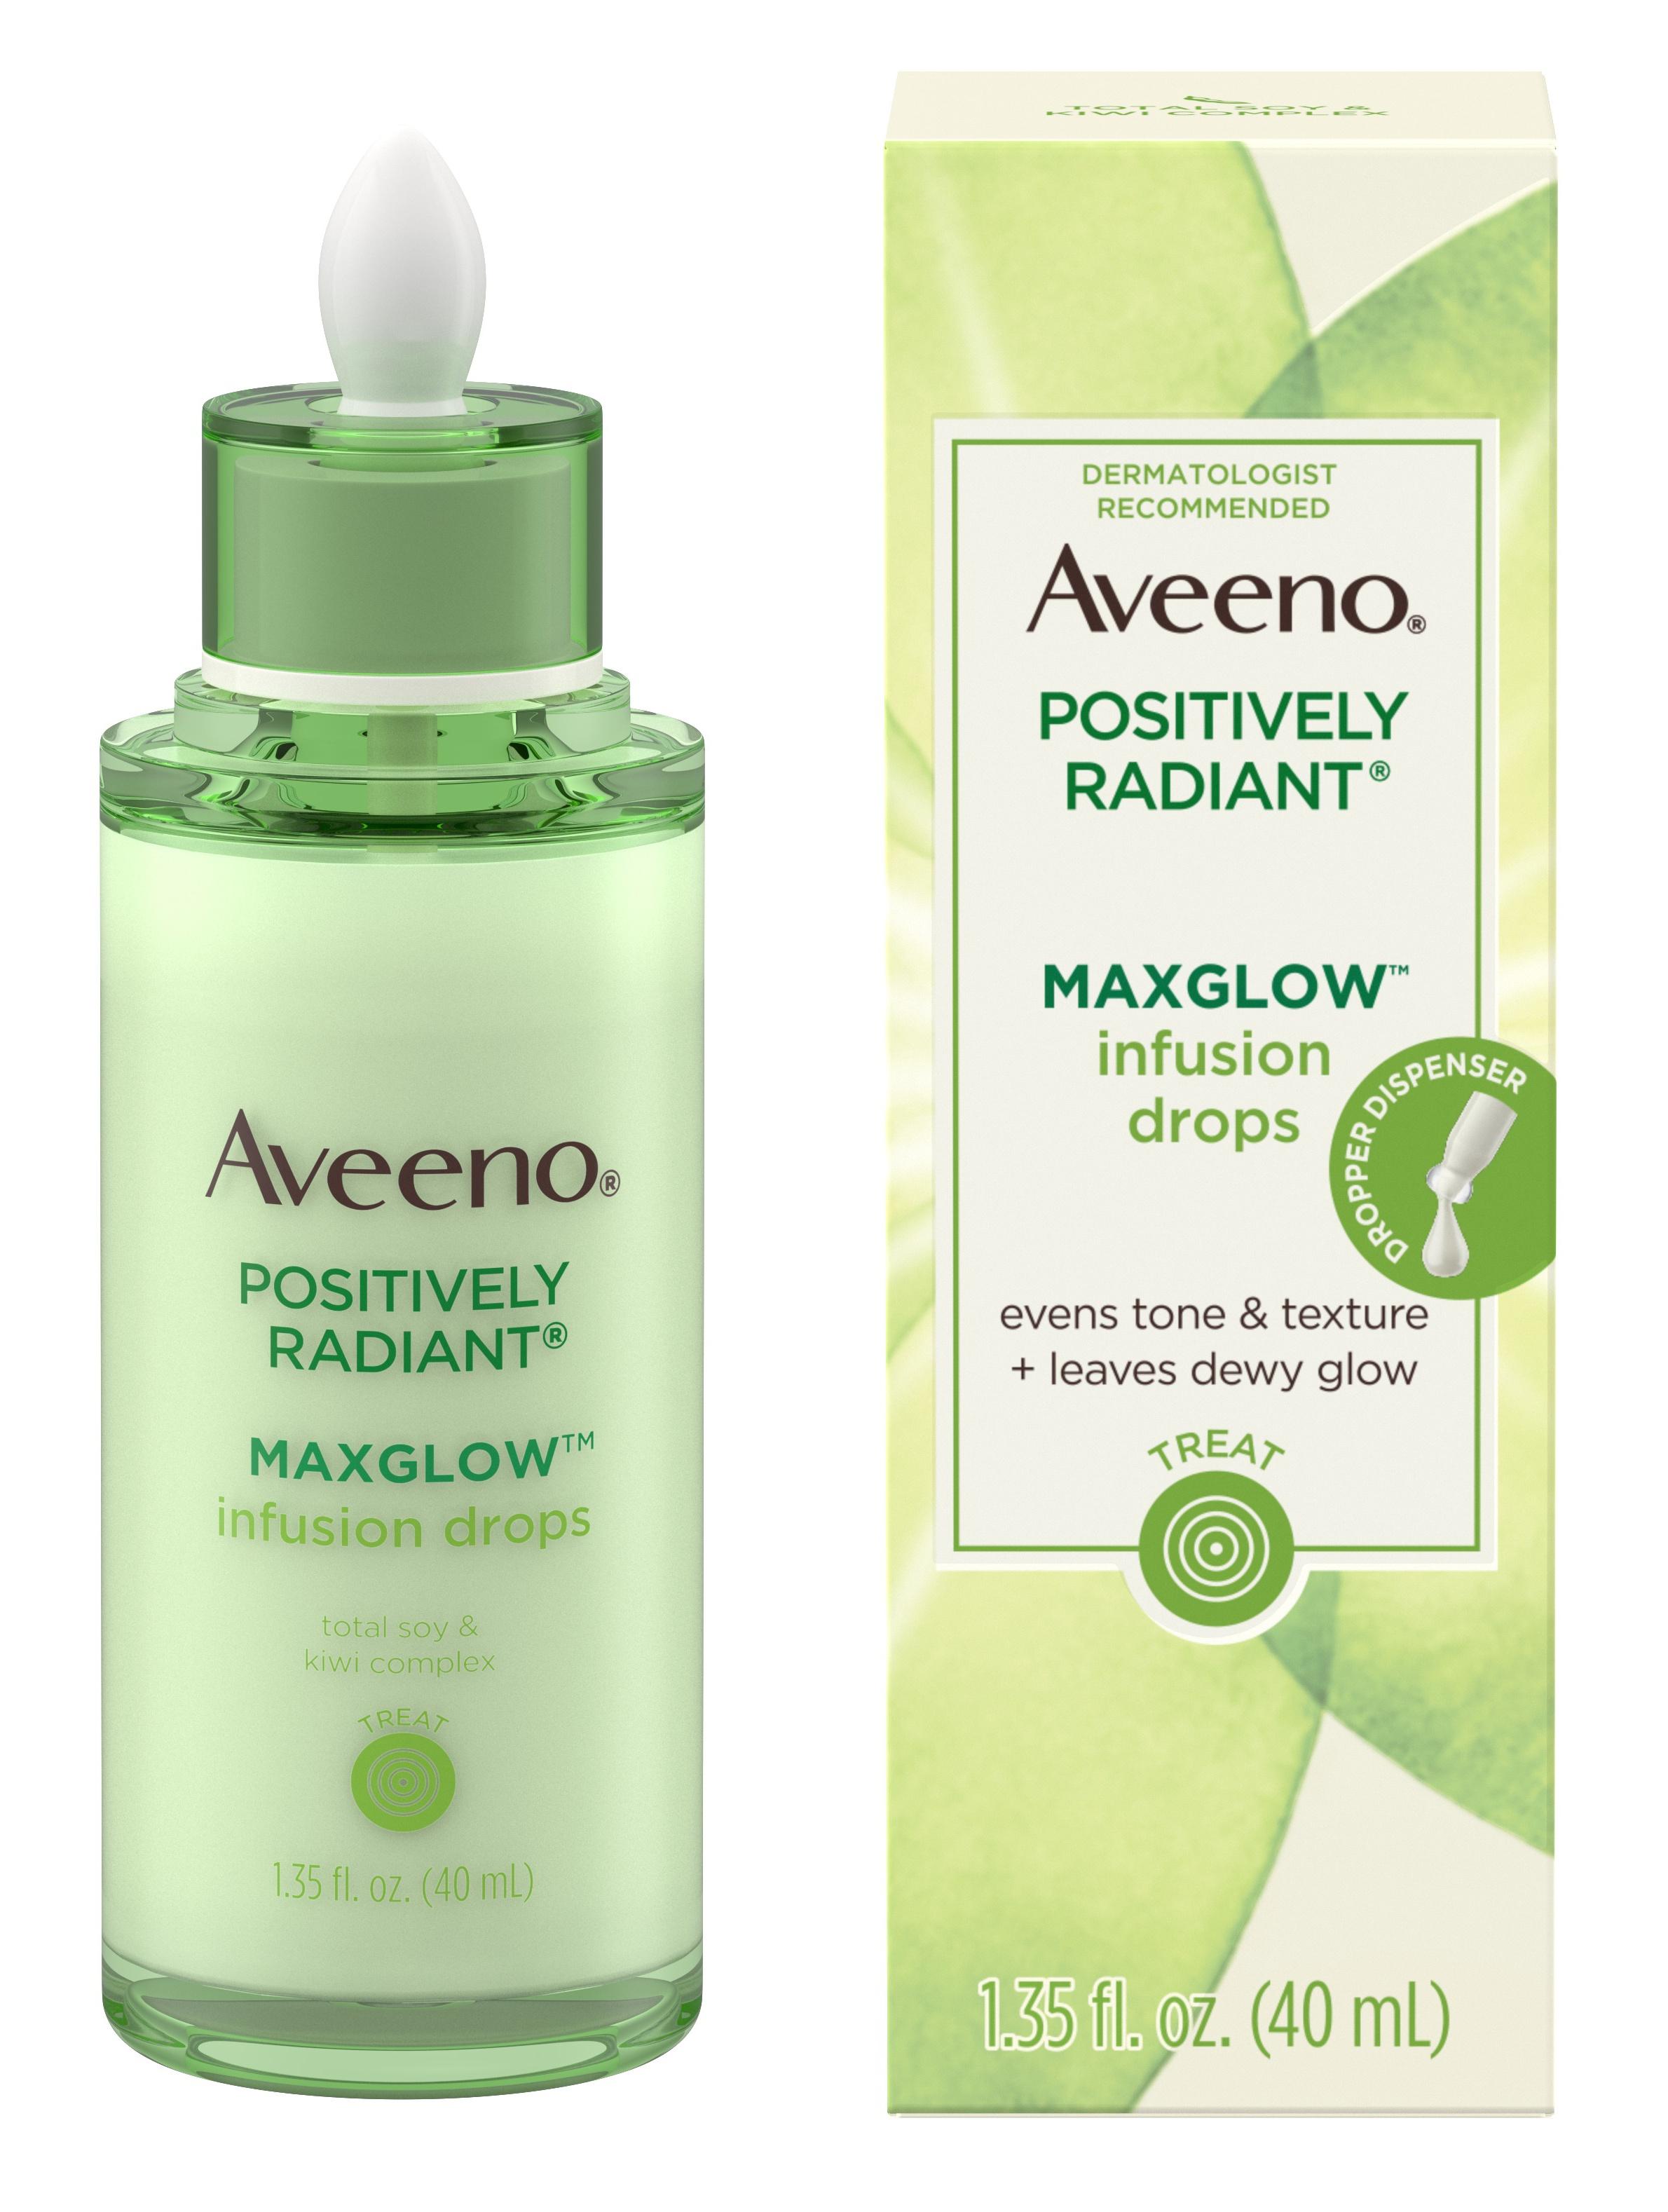 Aveeno Positively Radiant Maxglow Infusion Drops Drops